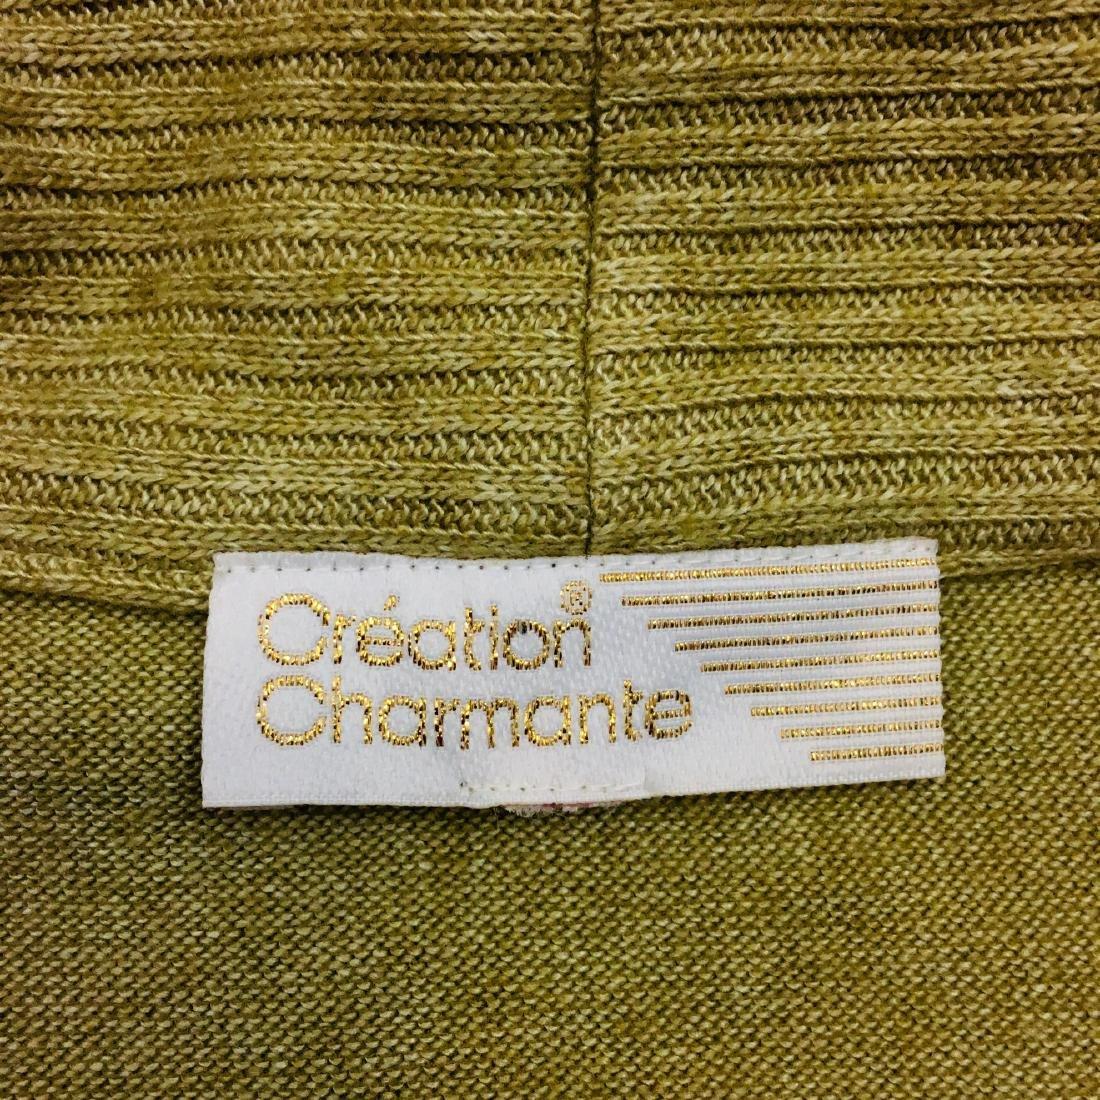 Women's Creation Charmante Wool Blend Cardigan Sweater - 6